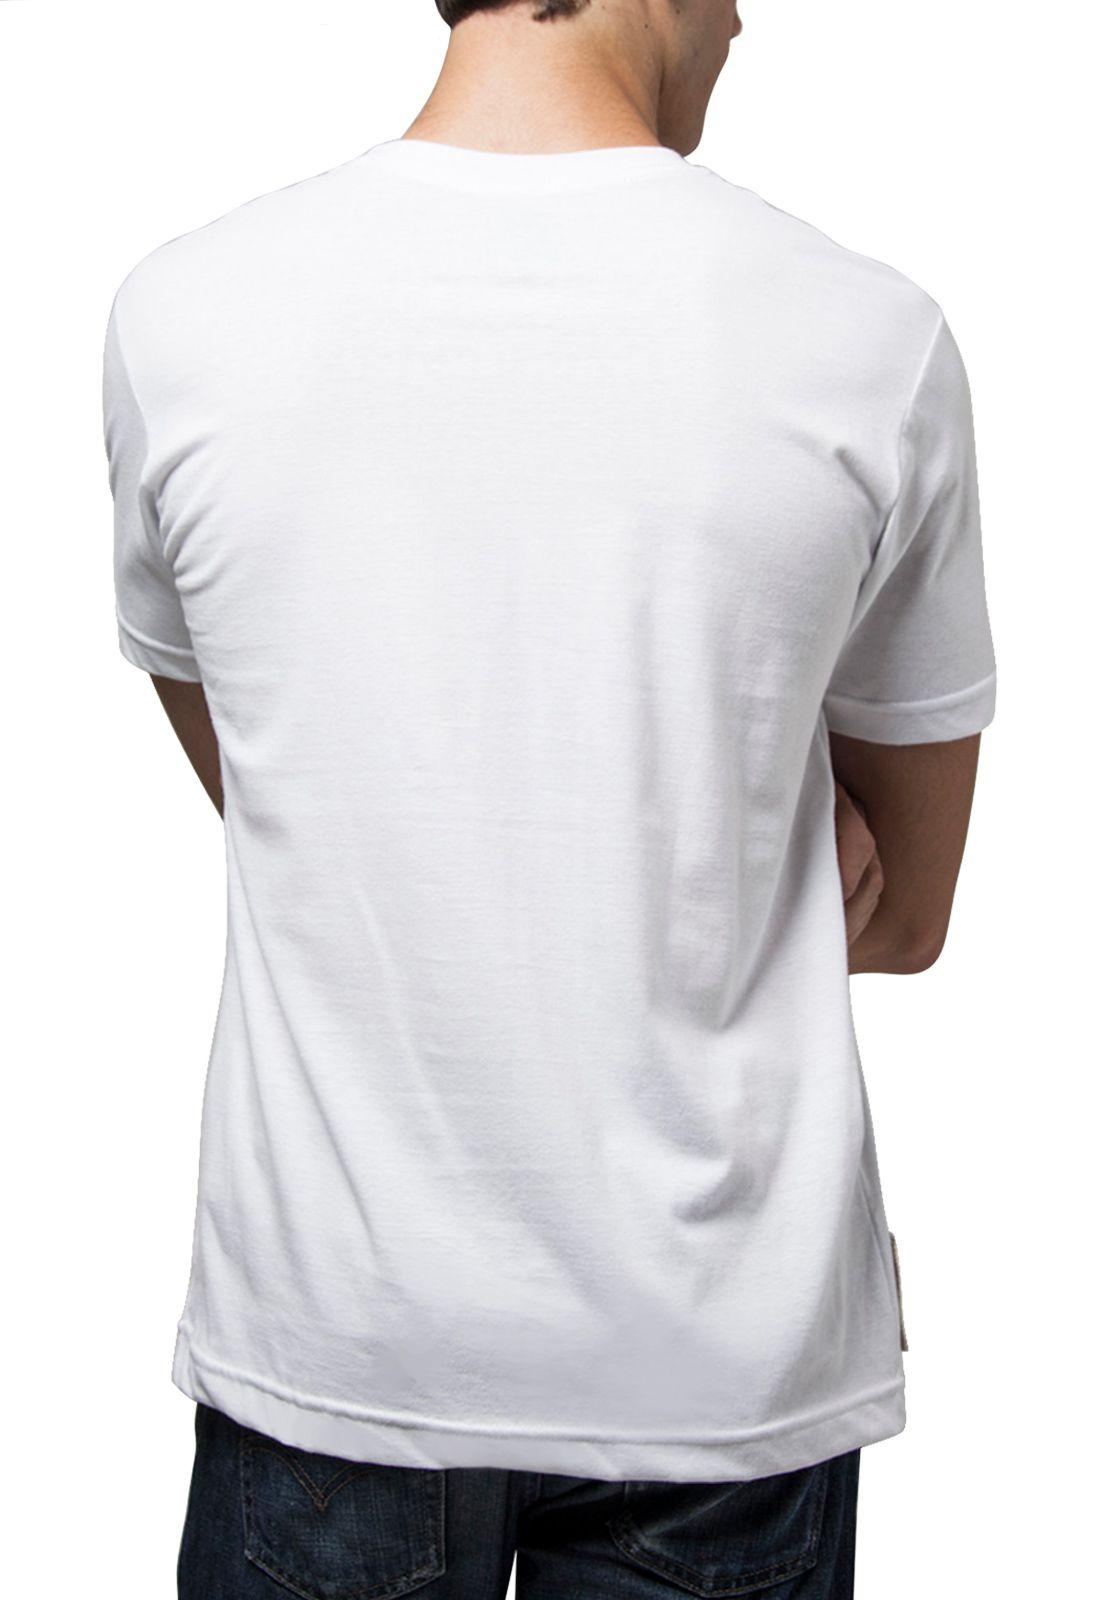 Camiseta Amazônia Bike Respect - Branco